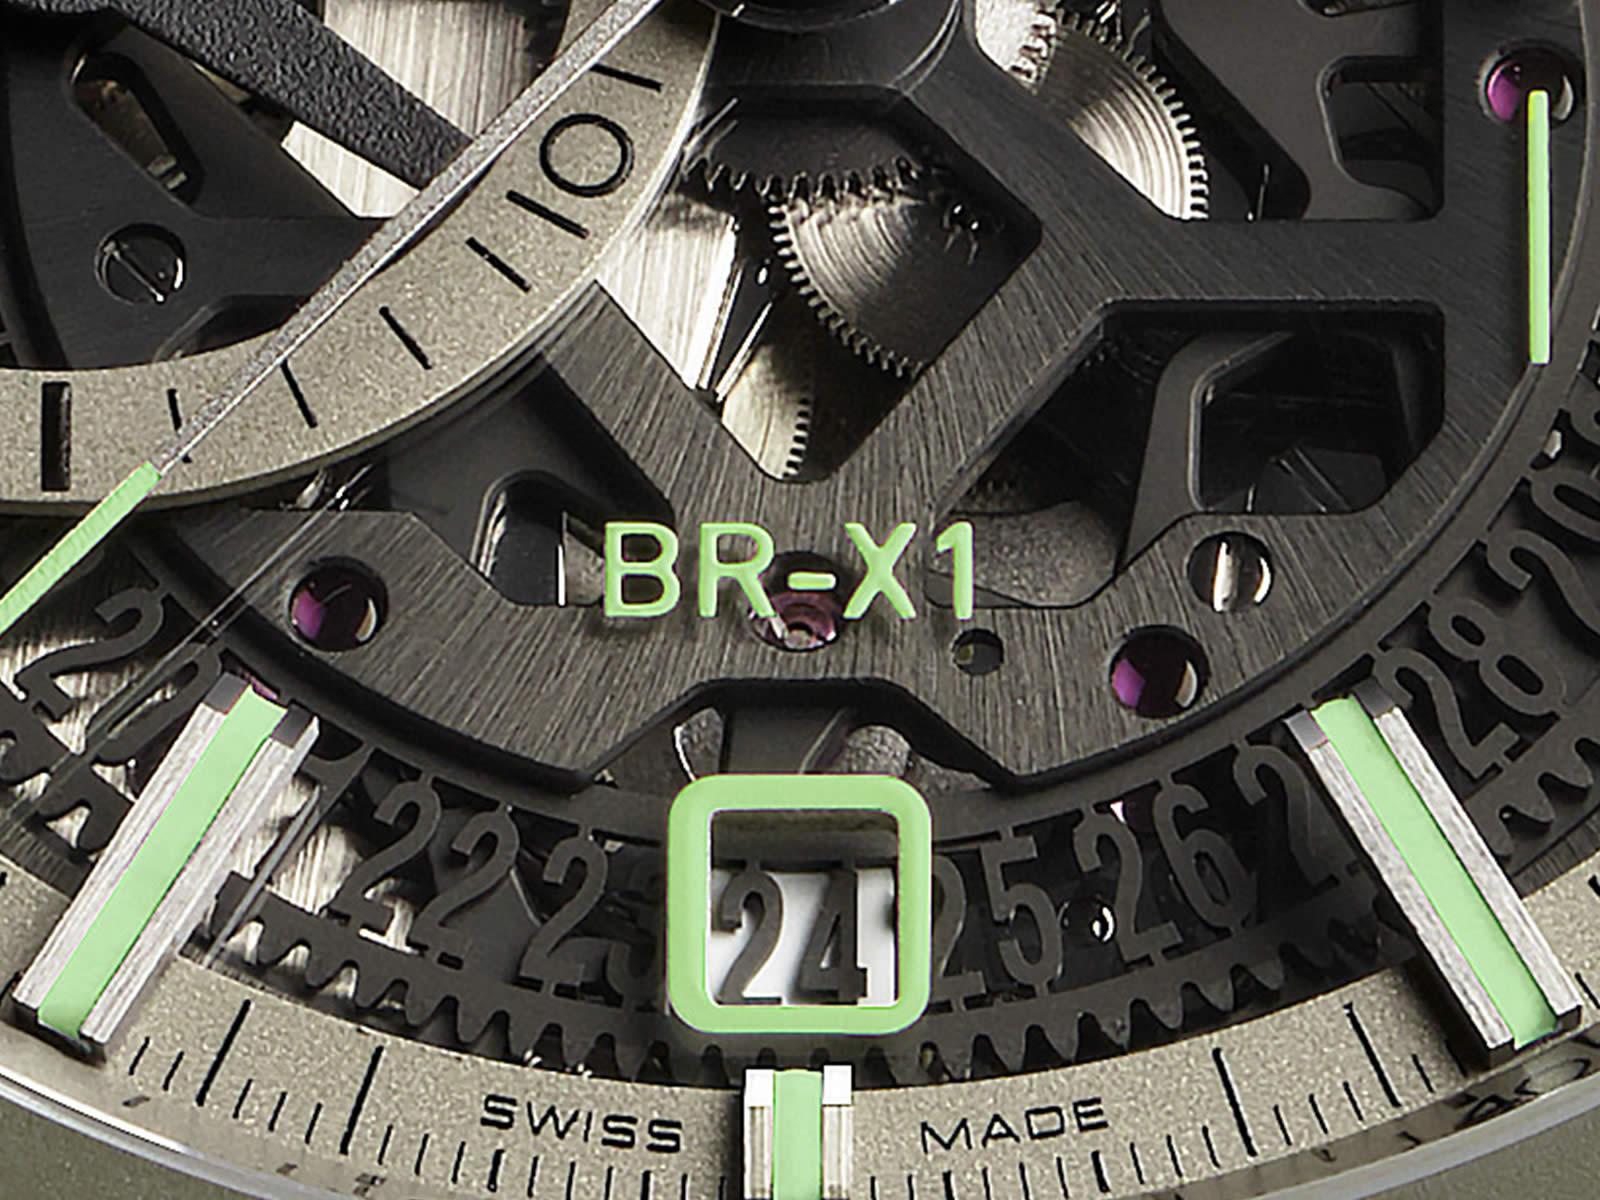 brx1-ce-ti-mil-bell-ross-br-x1-military-8.jpg